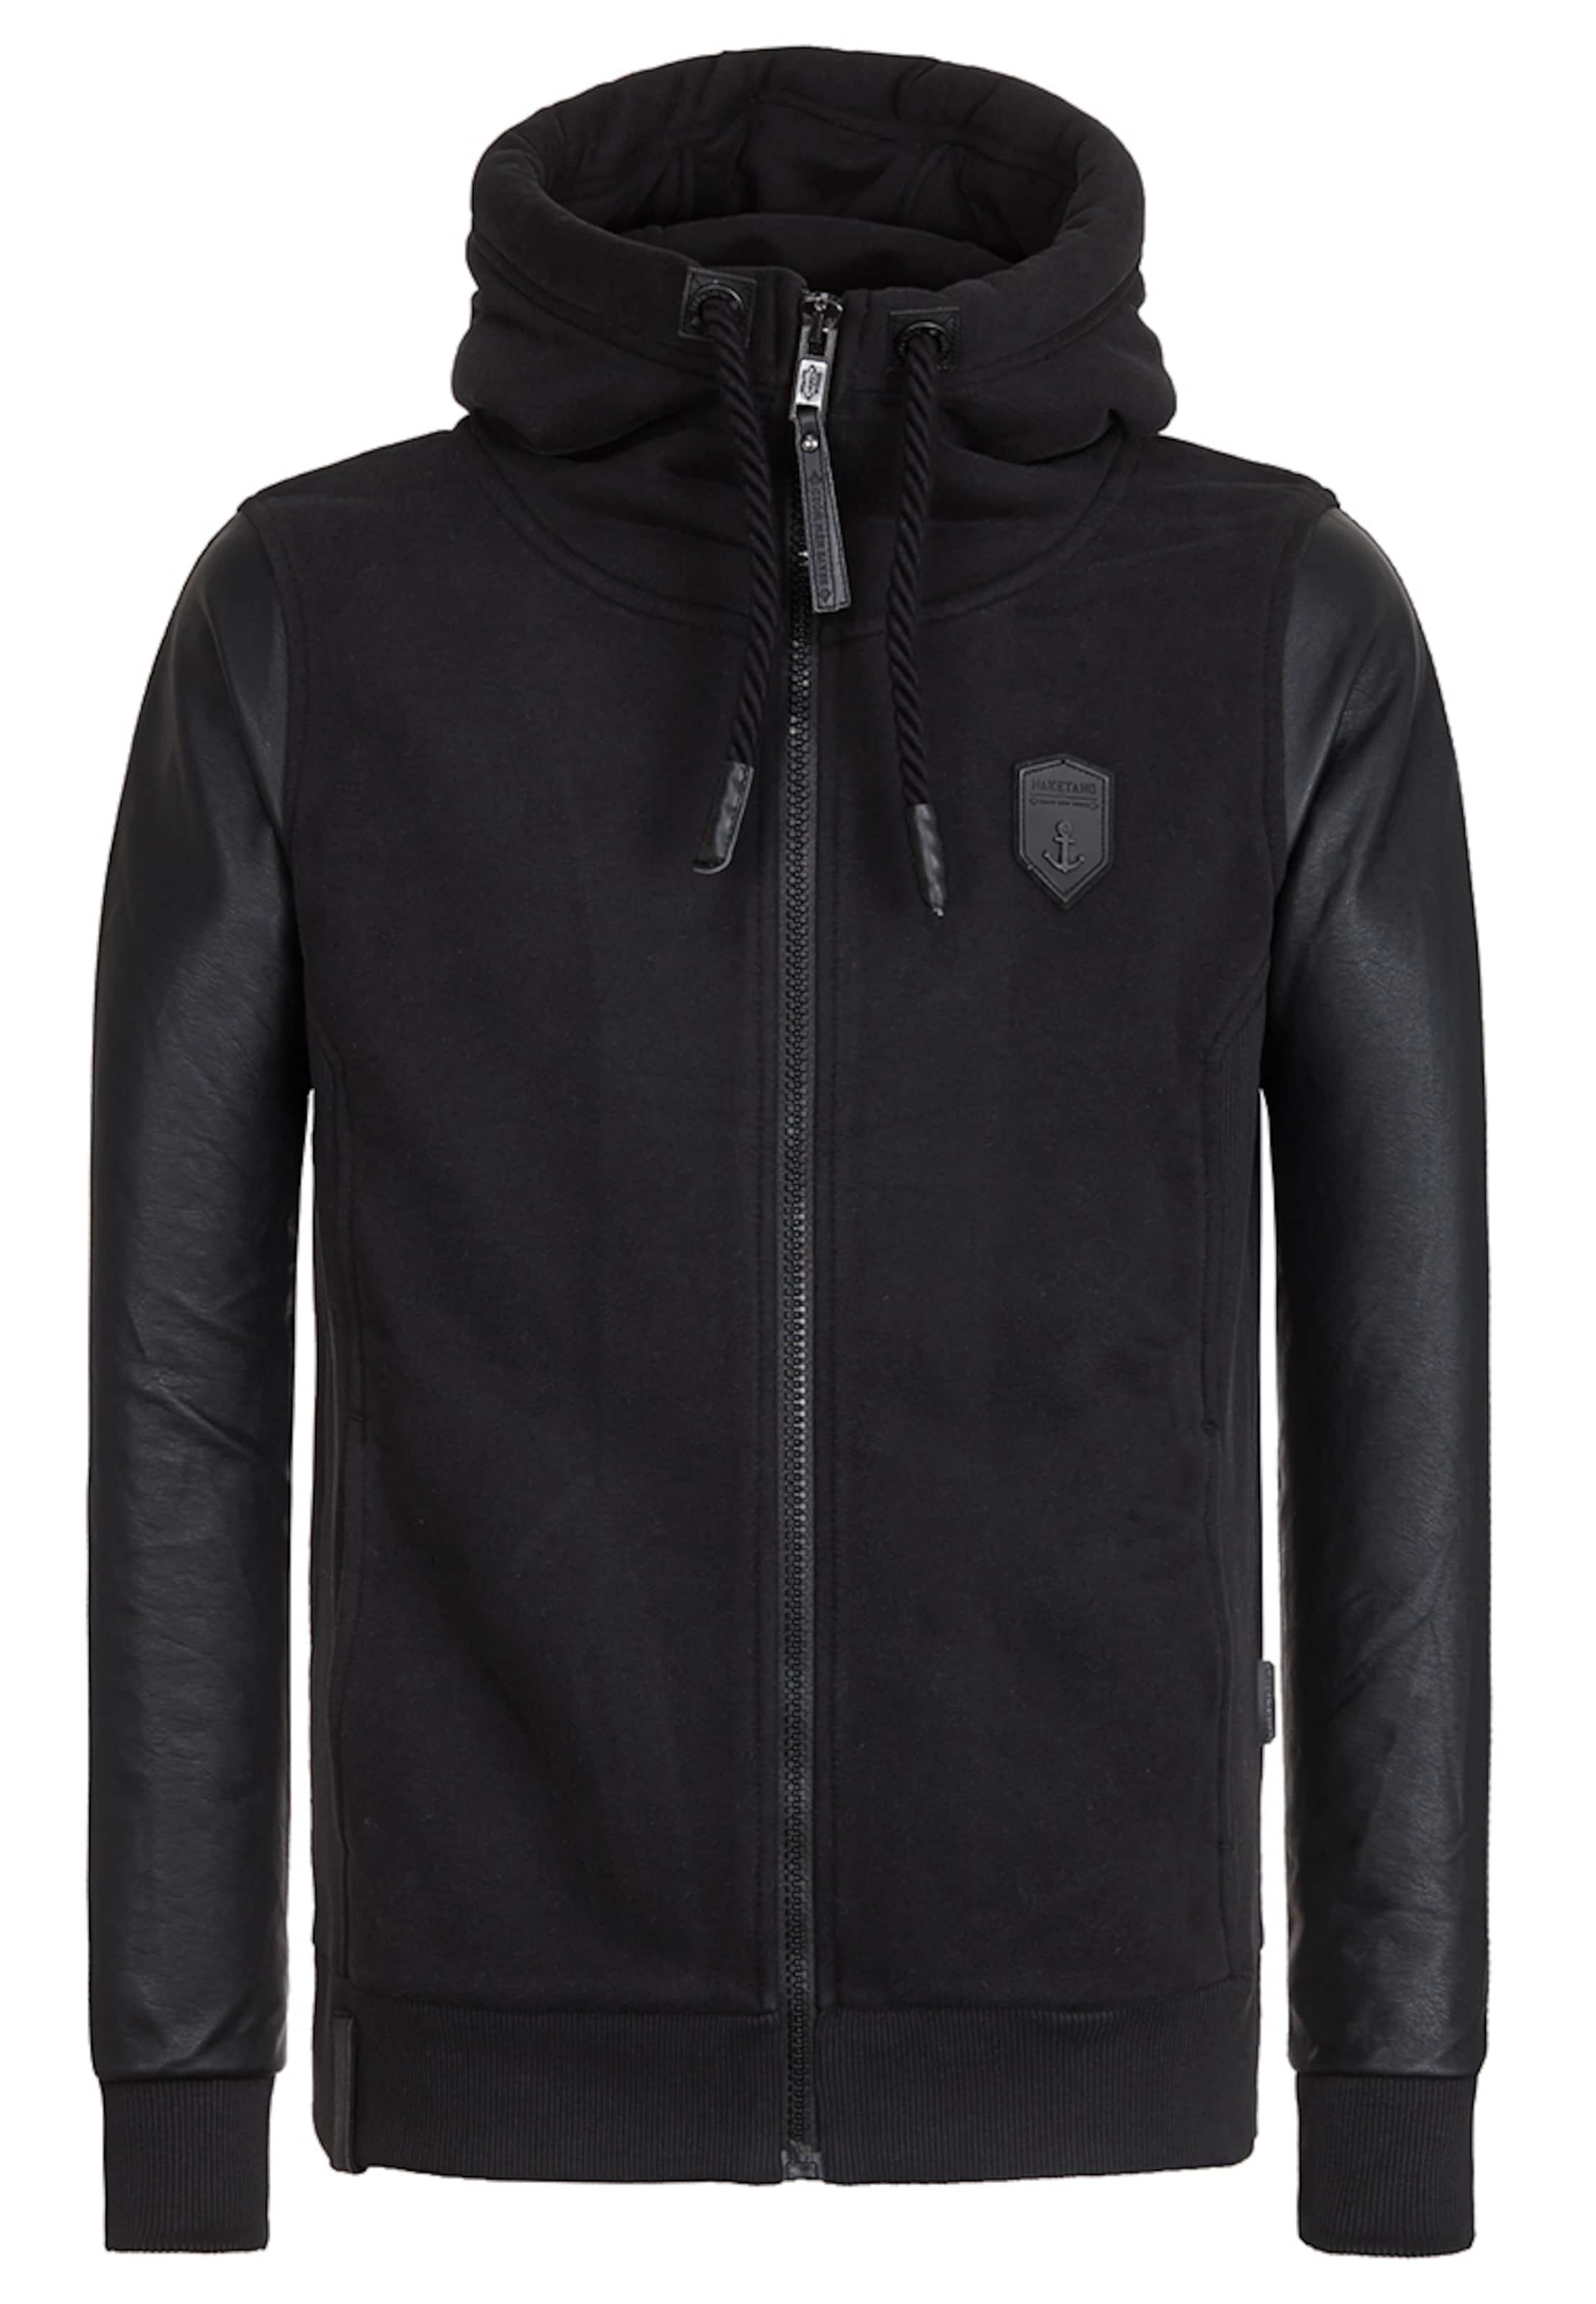 naketano Male Zipped Jacket Black 'Guck Auf Den Boden' 2018 Auslaß ZNaR7rJD